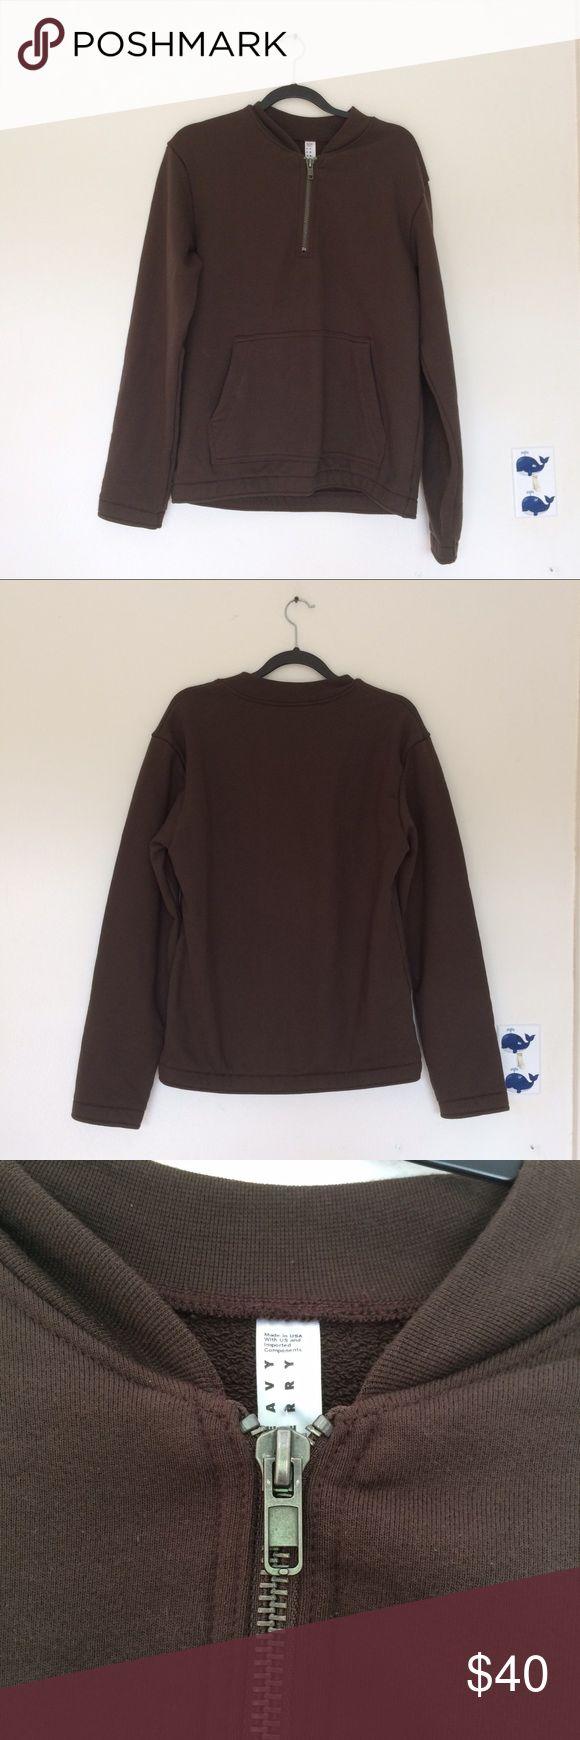 American Apparel Heavy Terry Half Zip Pullover Unisex/men's Medium Dark brown - Molasses Cotton blend pullover with zipper at neckline Kangaroo pockets American Apparel Jackets & Coats